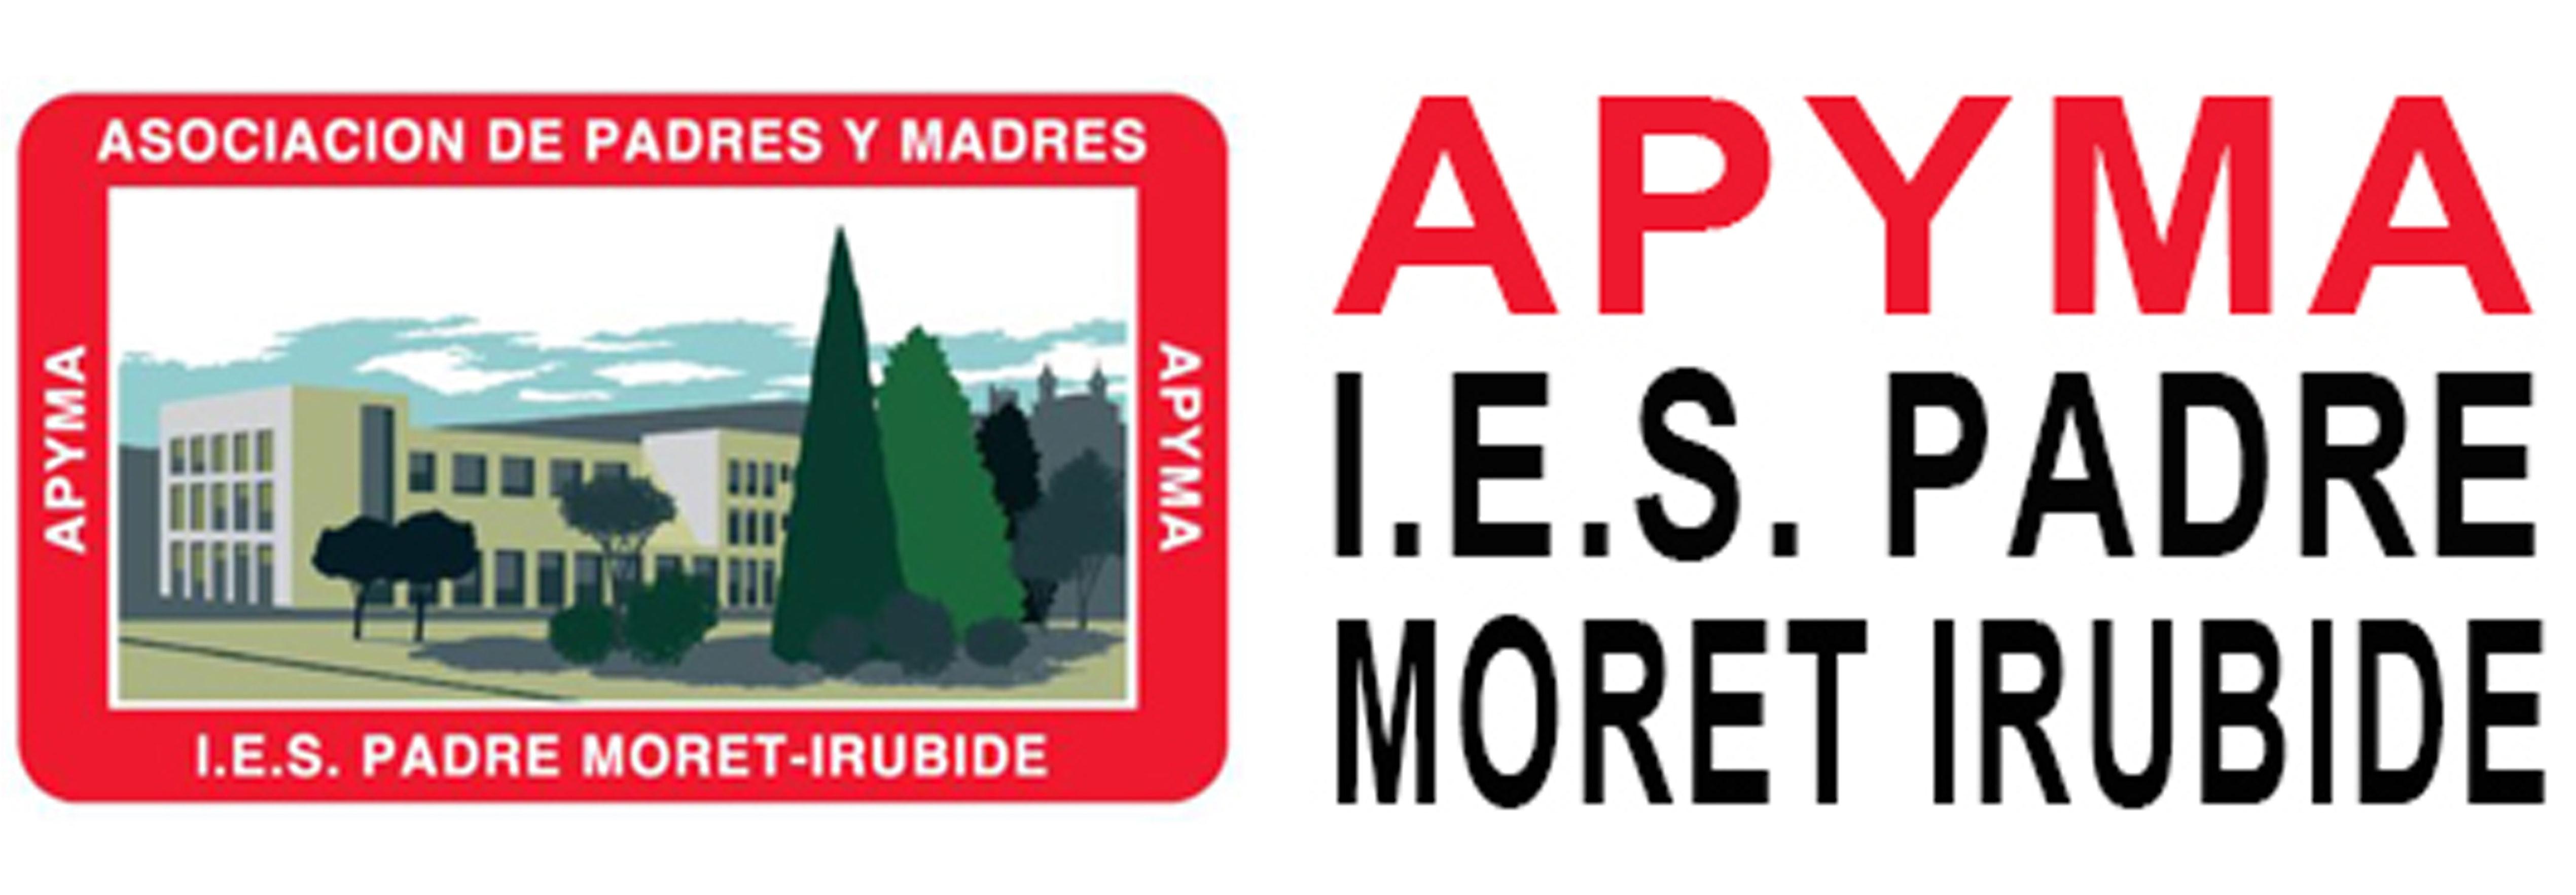 APYMA I.E.S PADRE MORET-IRUBIDE